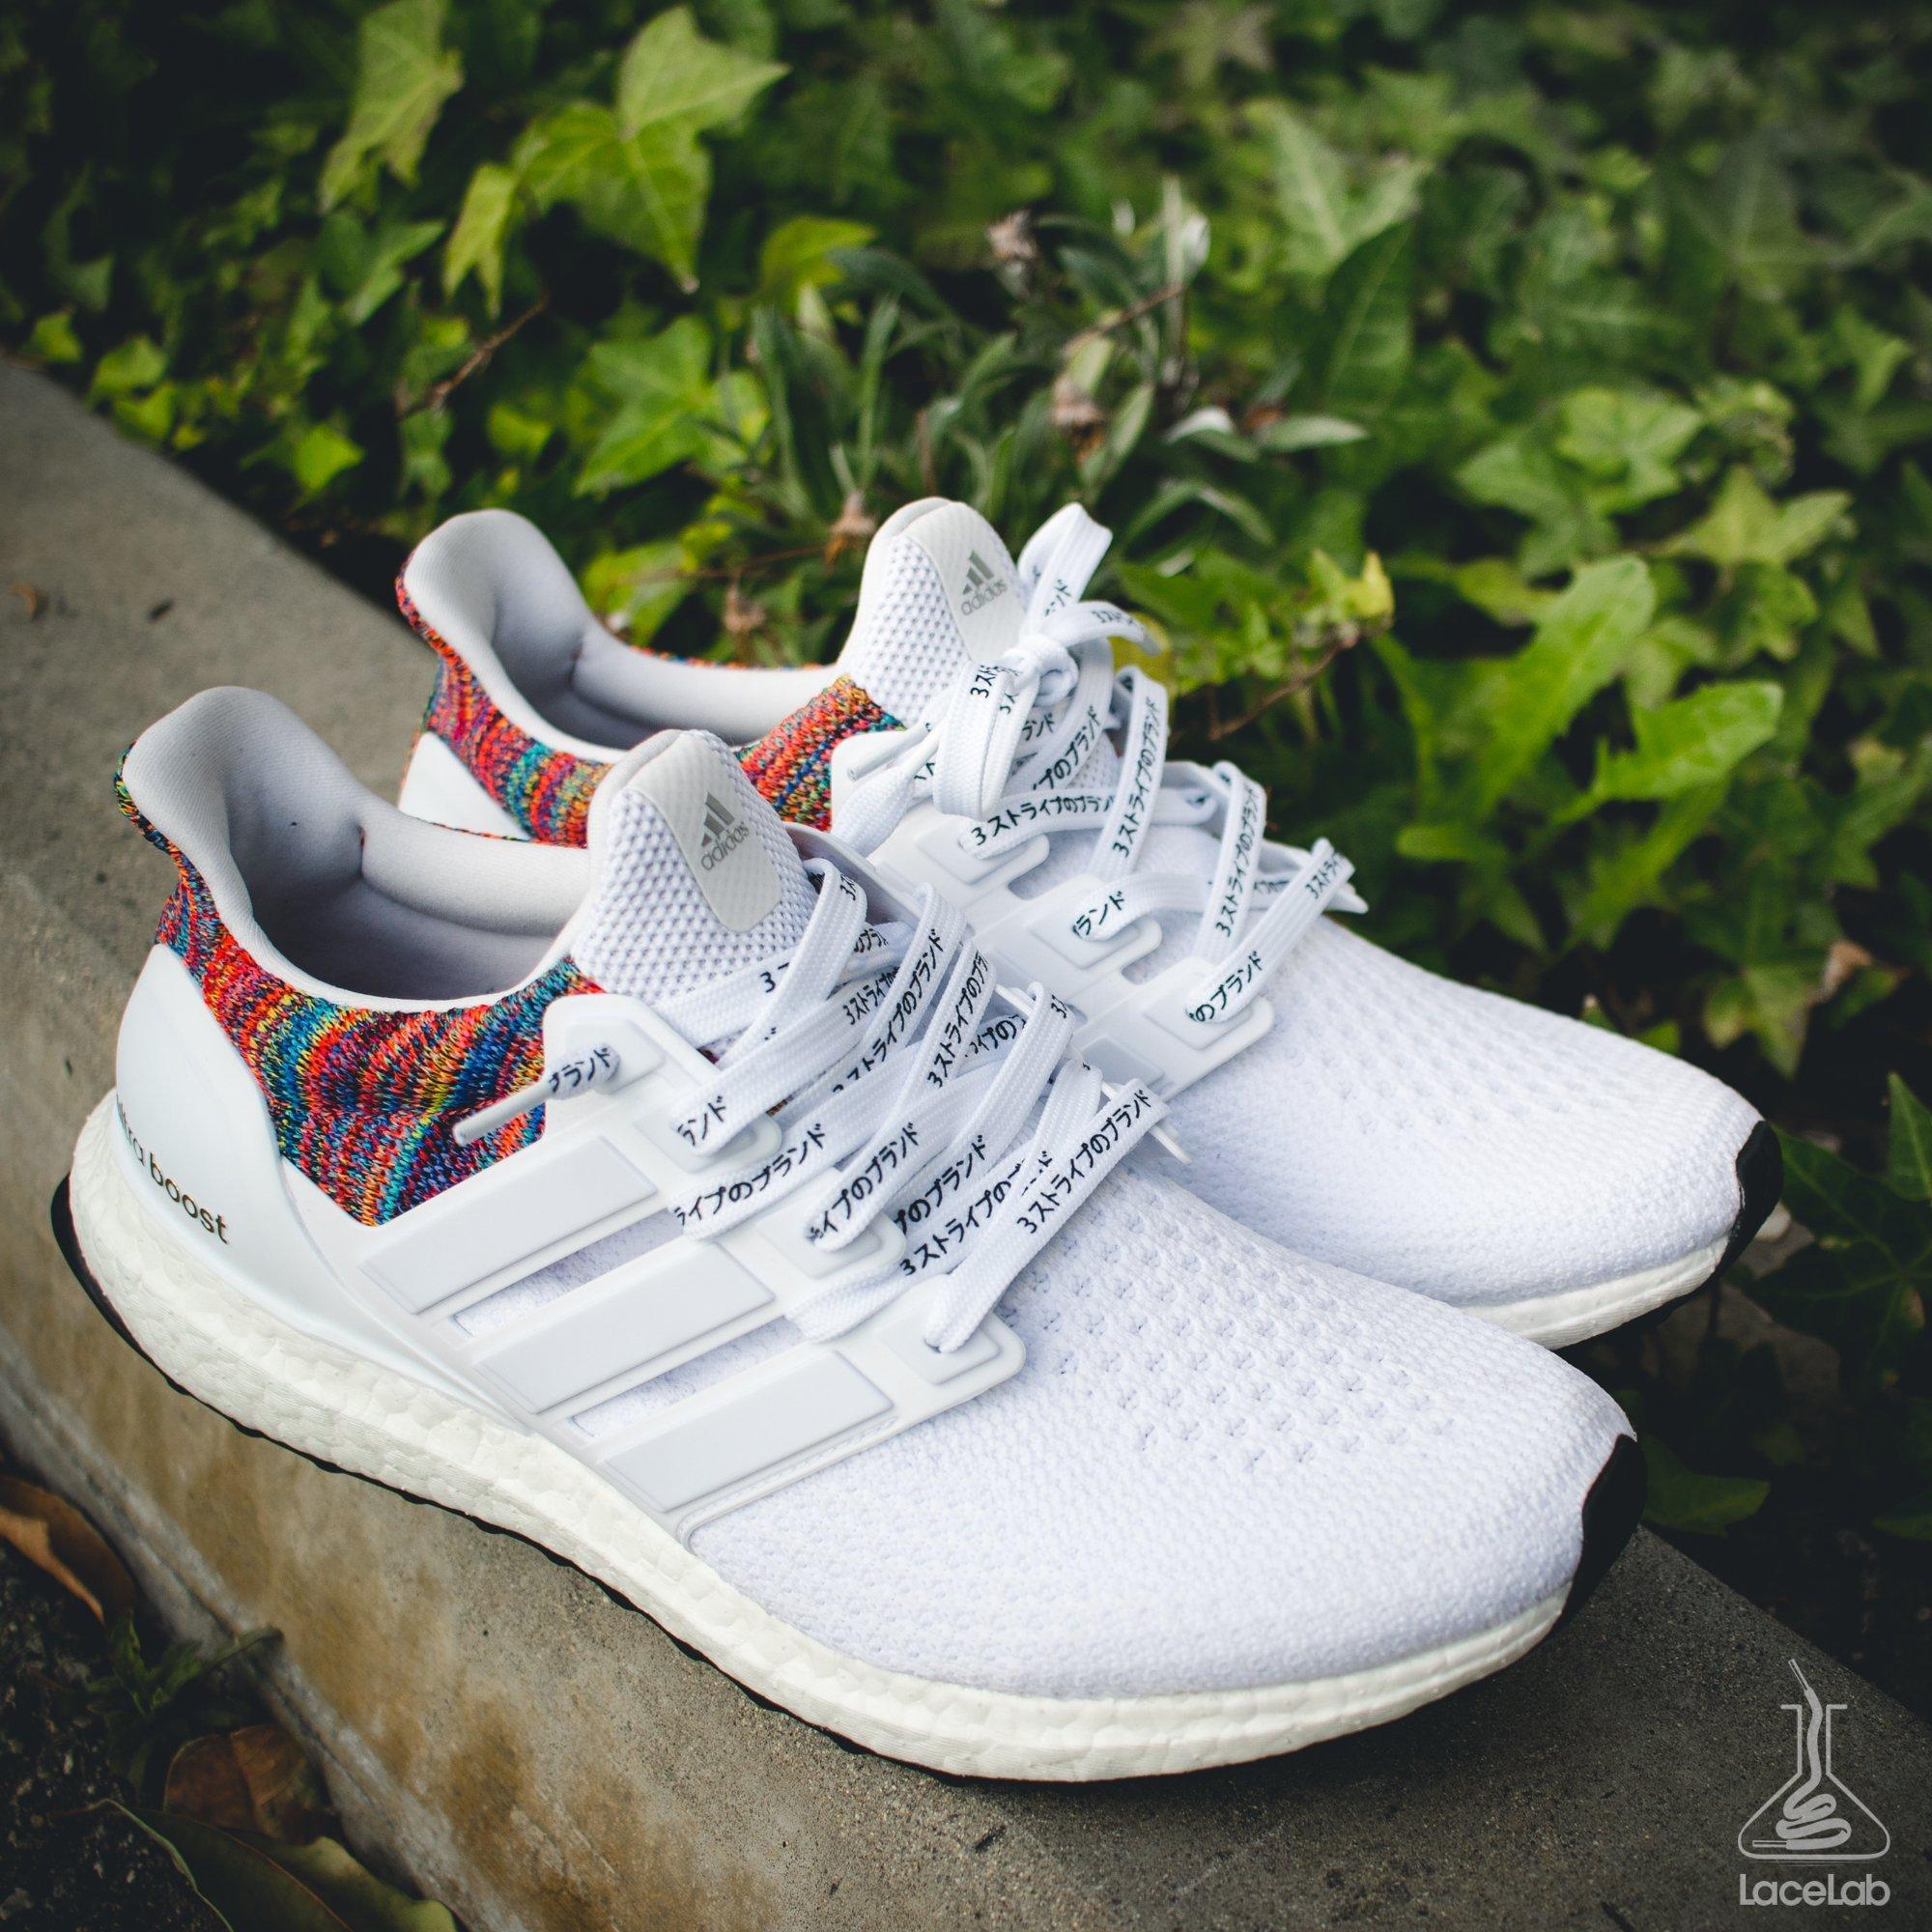 ultra boost custom laces